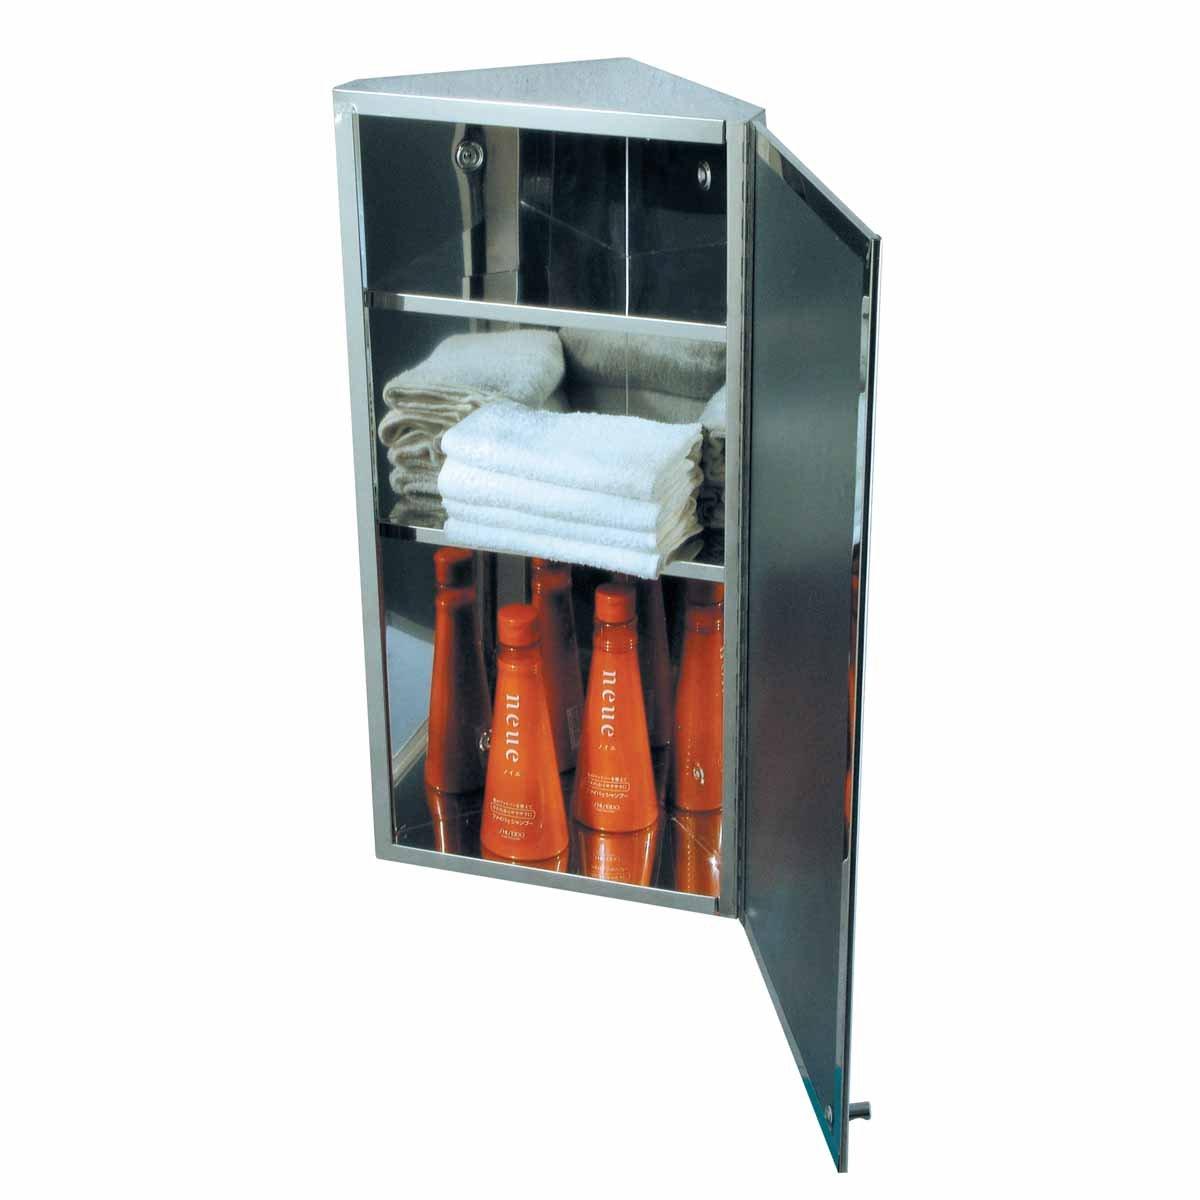 Corner Medicine Cabinet Stainless Steel Mirrored Door Polished Triple Shelf Wall Mount Rustproof by Renovator's Supply